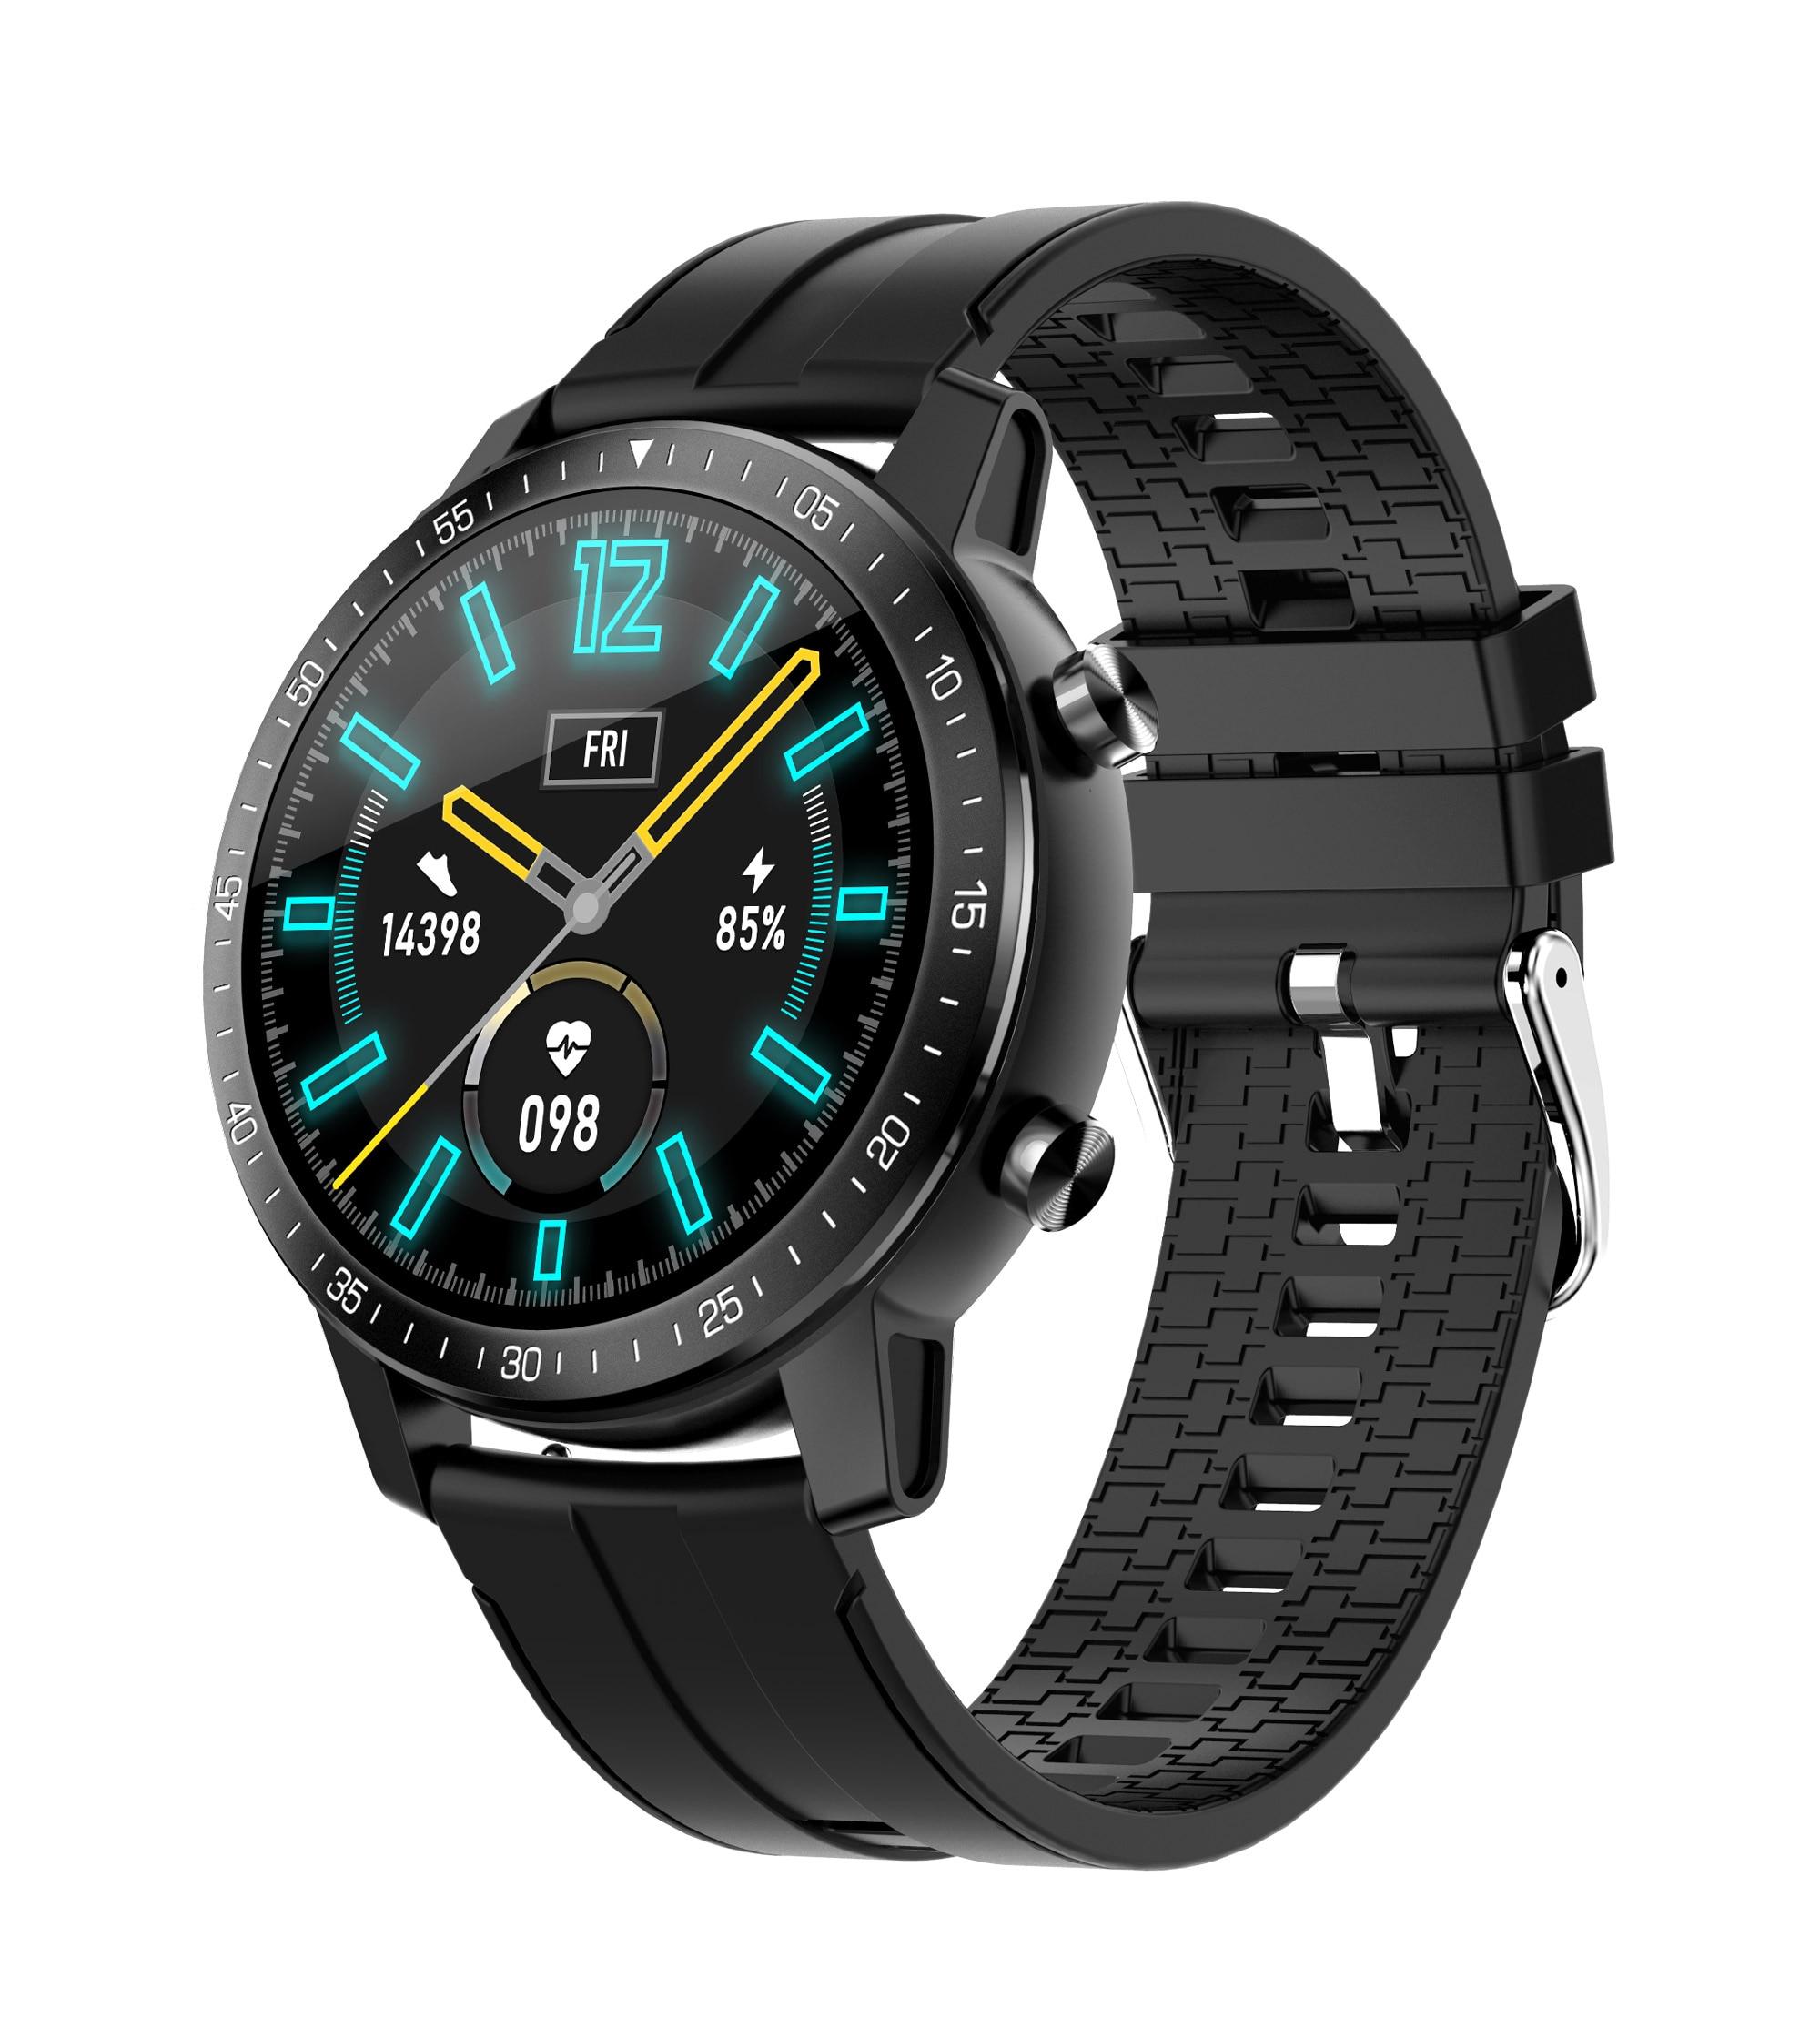 AliExpress - Willgallop S30 Smart Watches Smart Band Sport Fitness Tracker Pedometer Heart Rate Blood Pressure Monitor Bluetooth Bracelet Men